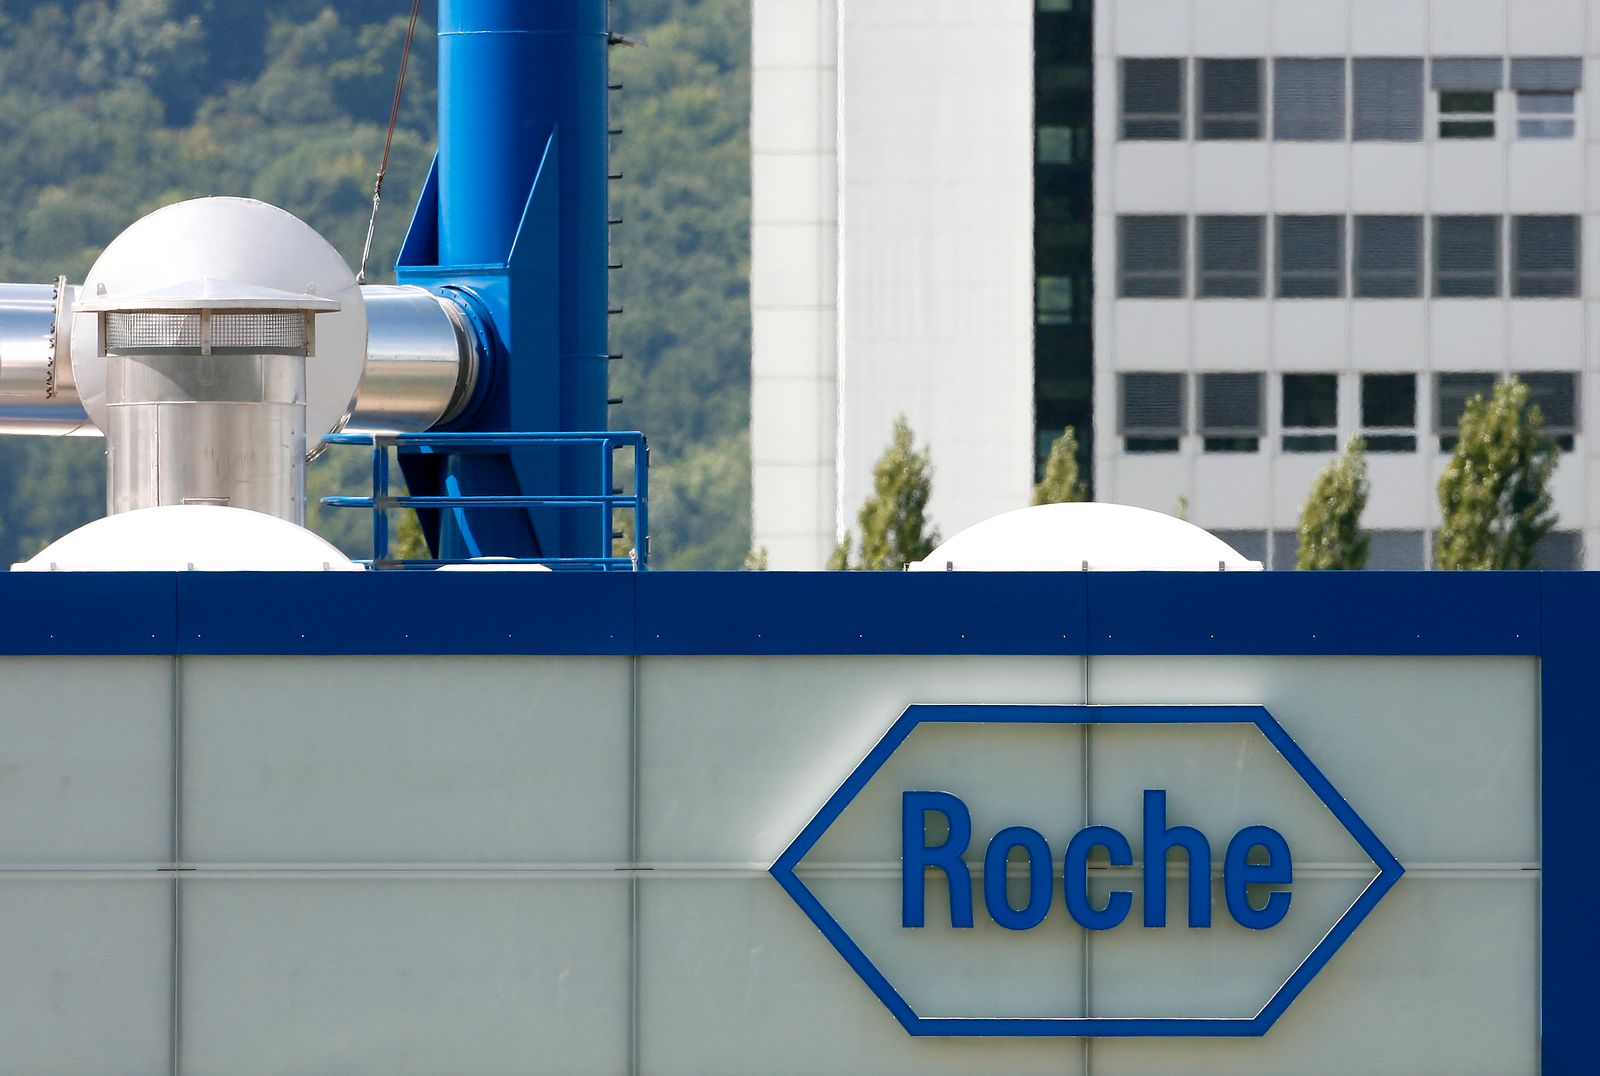 Roche / Schweiz / Fabrik / Pharma